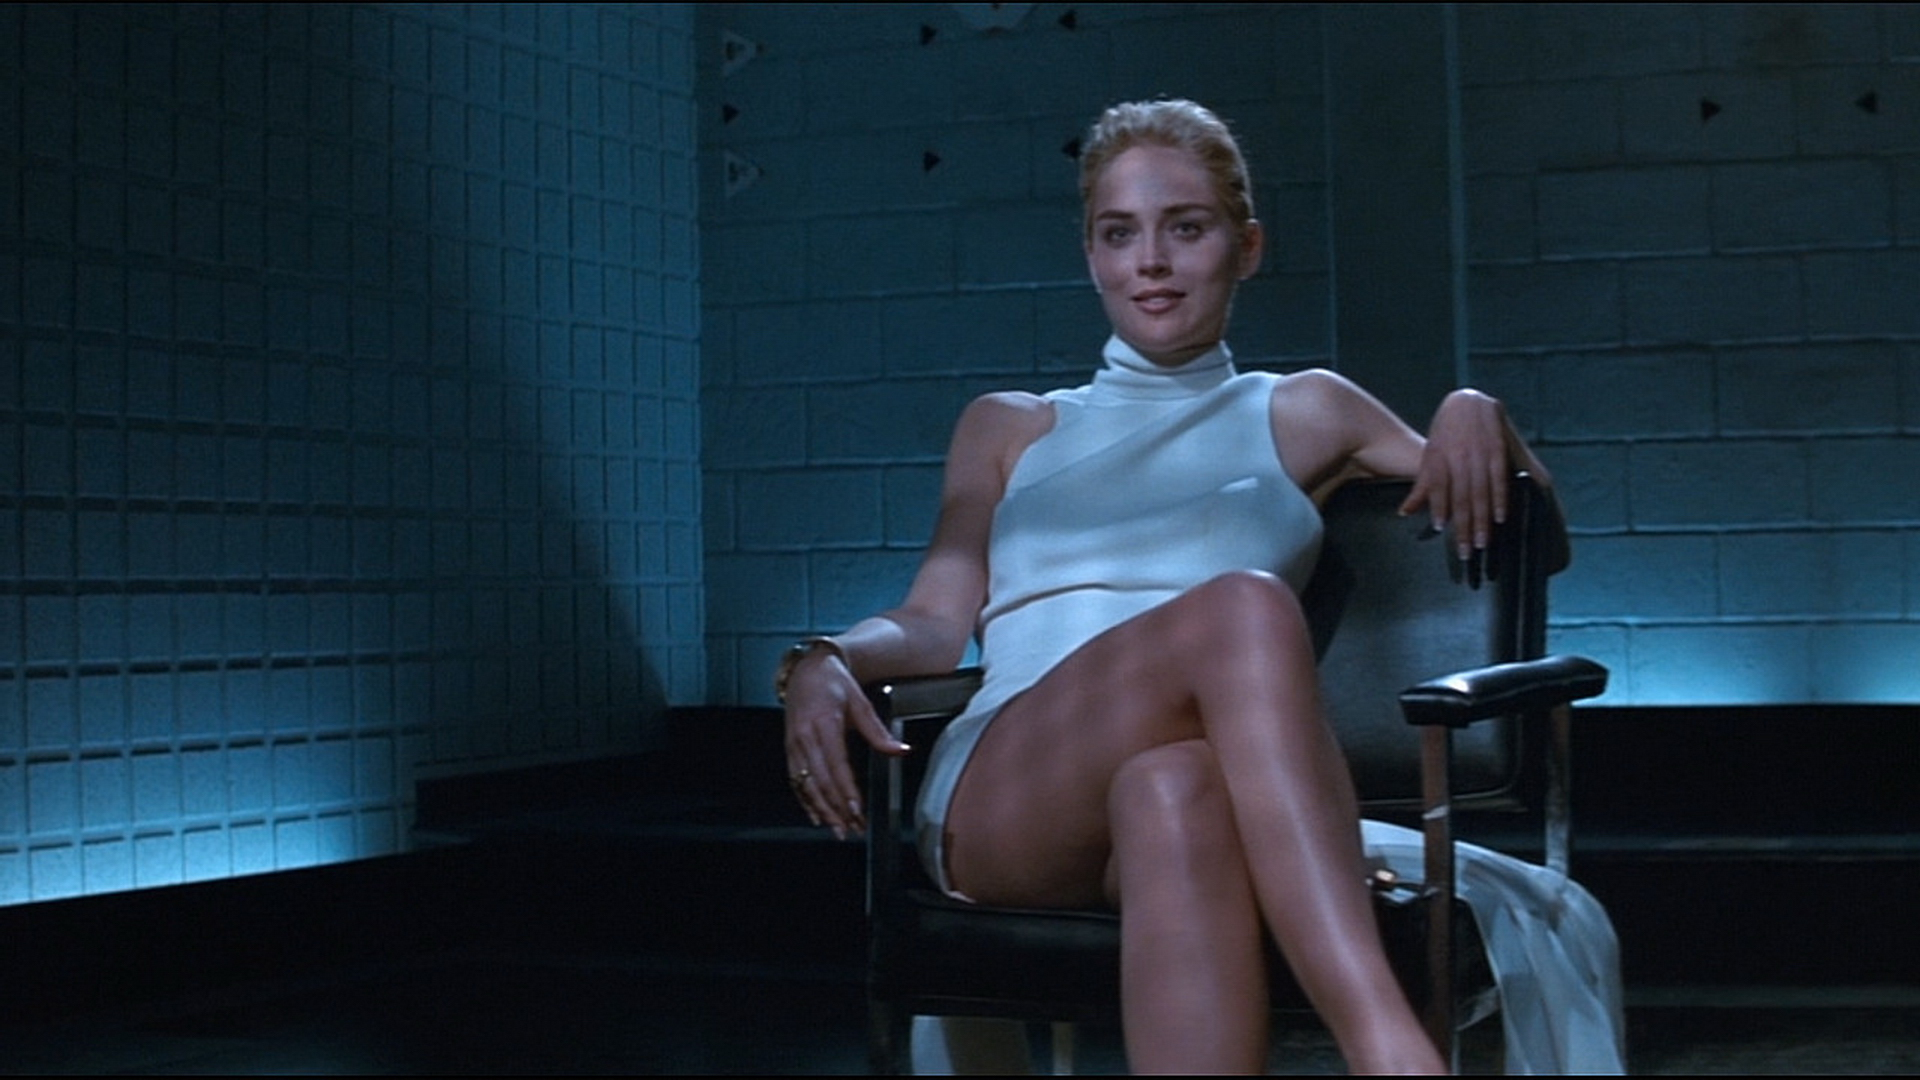 seksualnye kadry kino 25